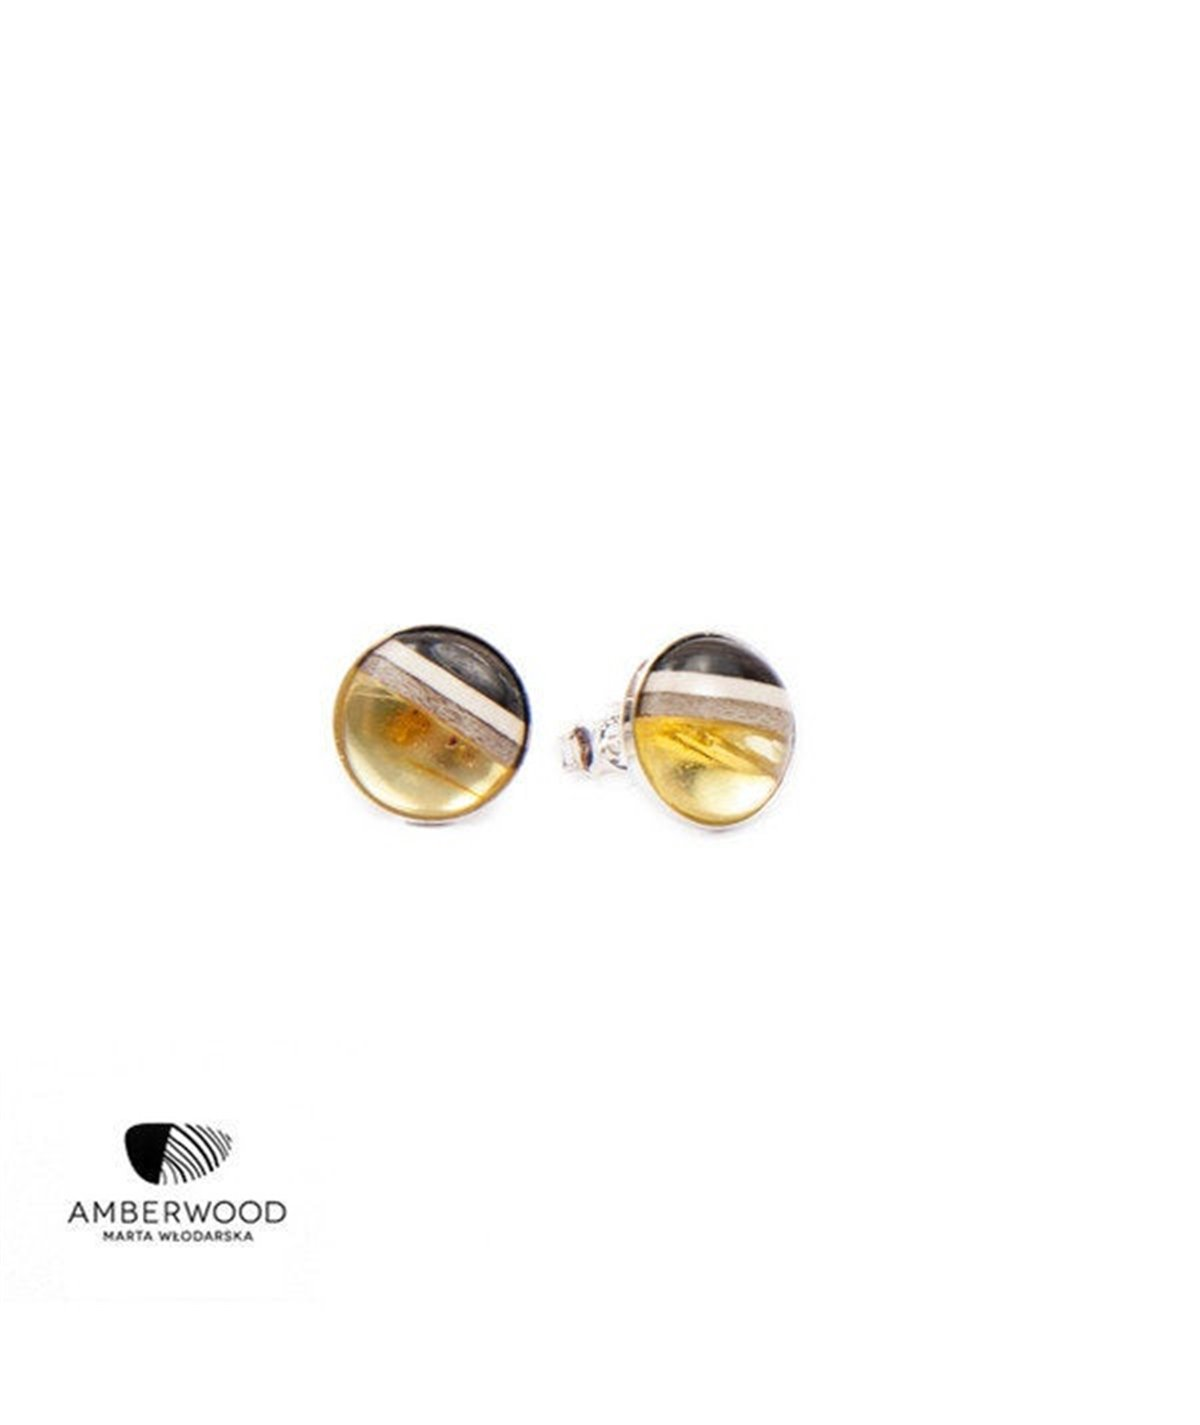 ROUND studs, baltic amber + wood + silver, transparent yellow, pin earrings by Amberwood Marta Wlodarska